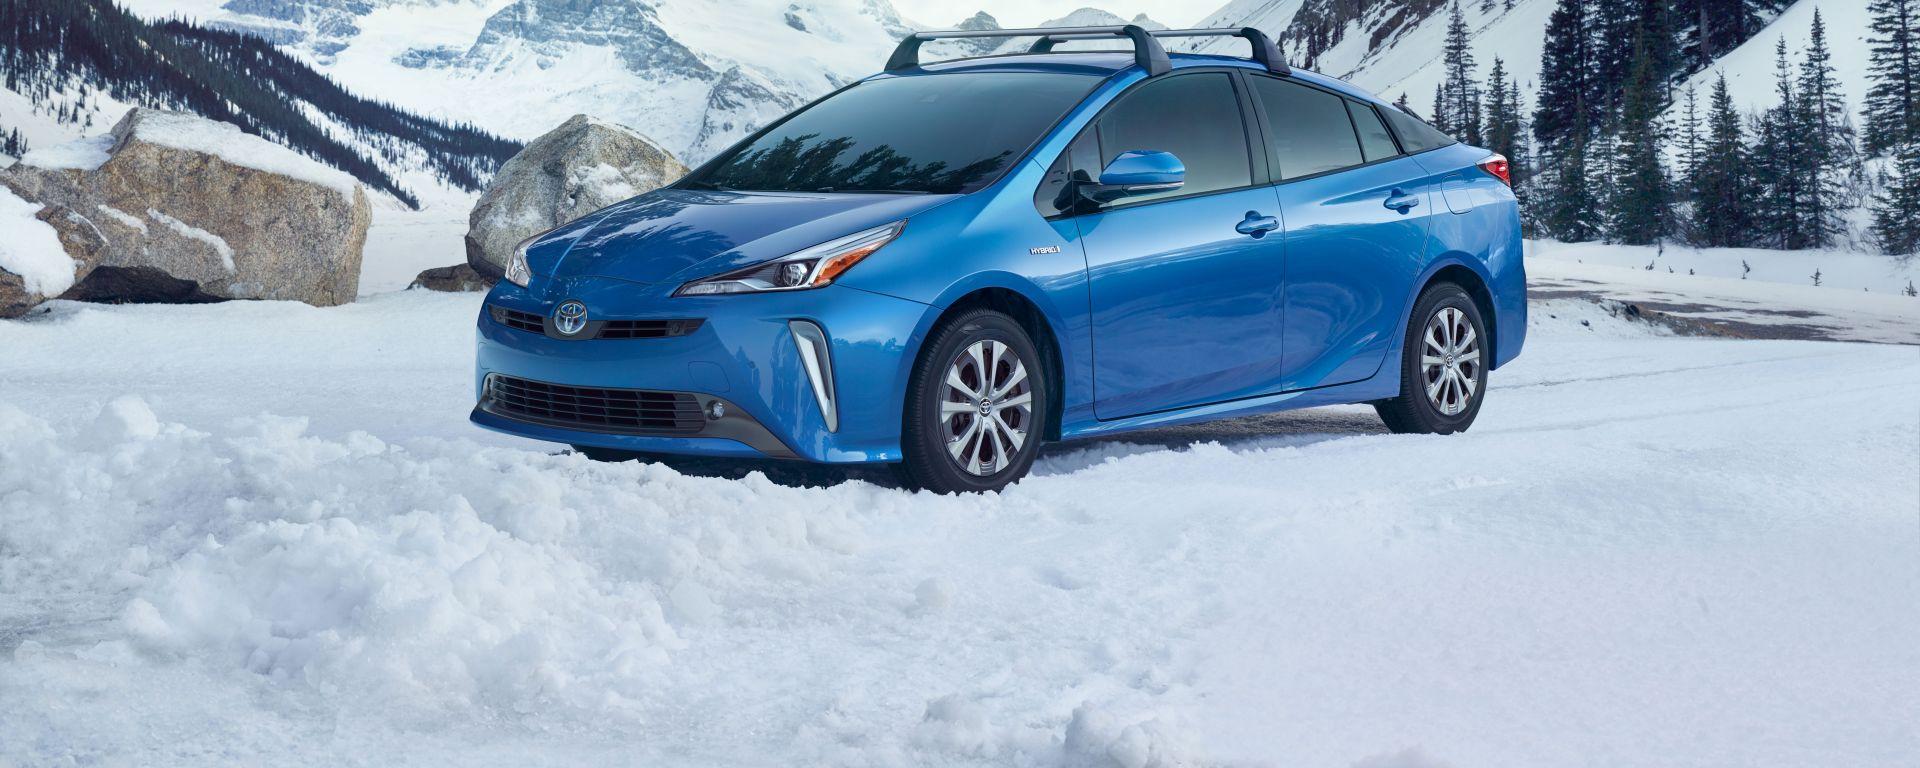 Nuova Toyota Prius AWD-e 2019